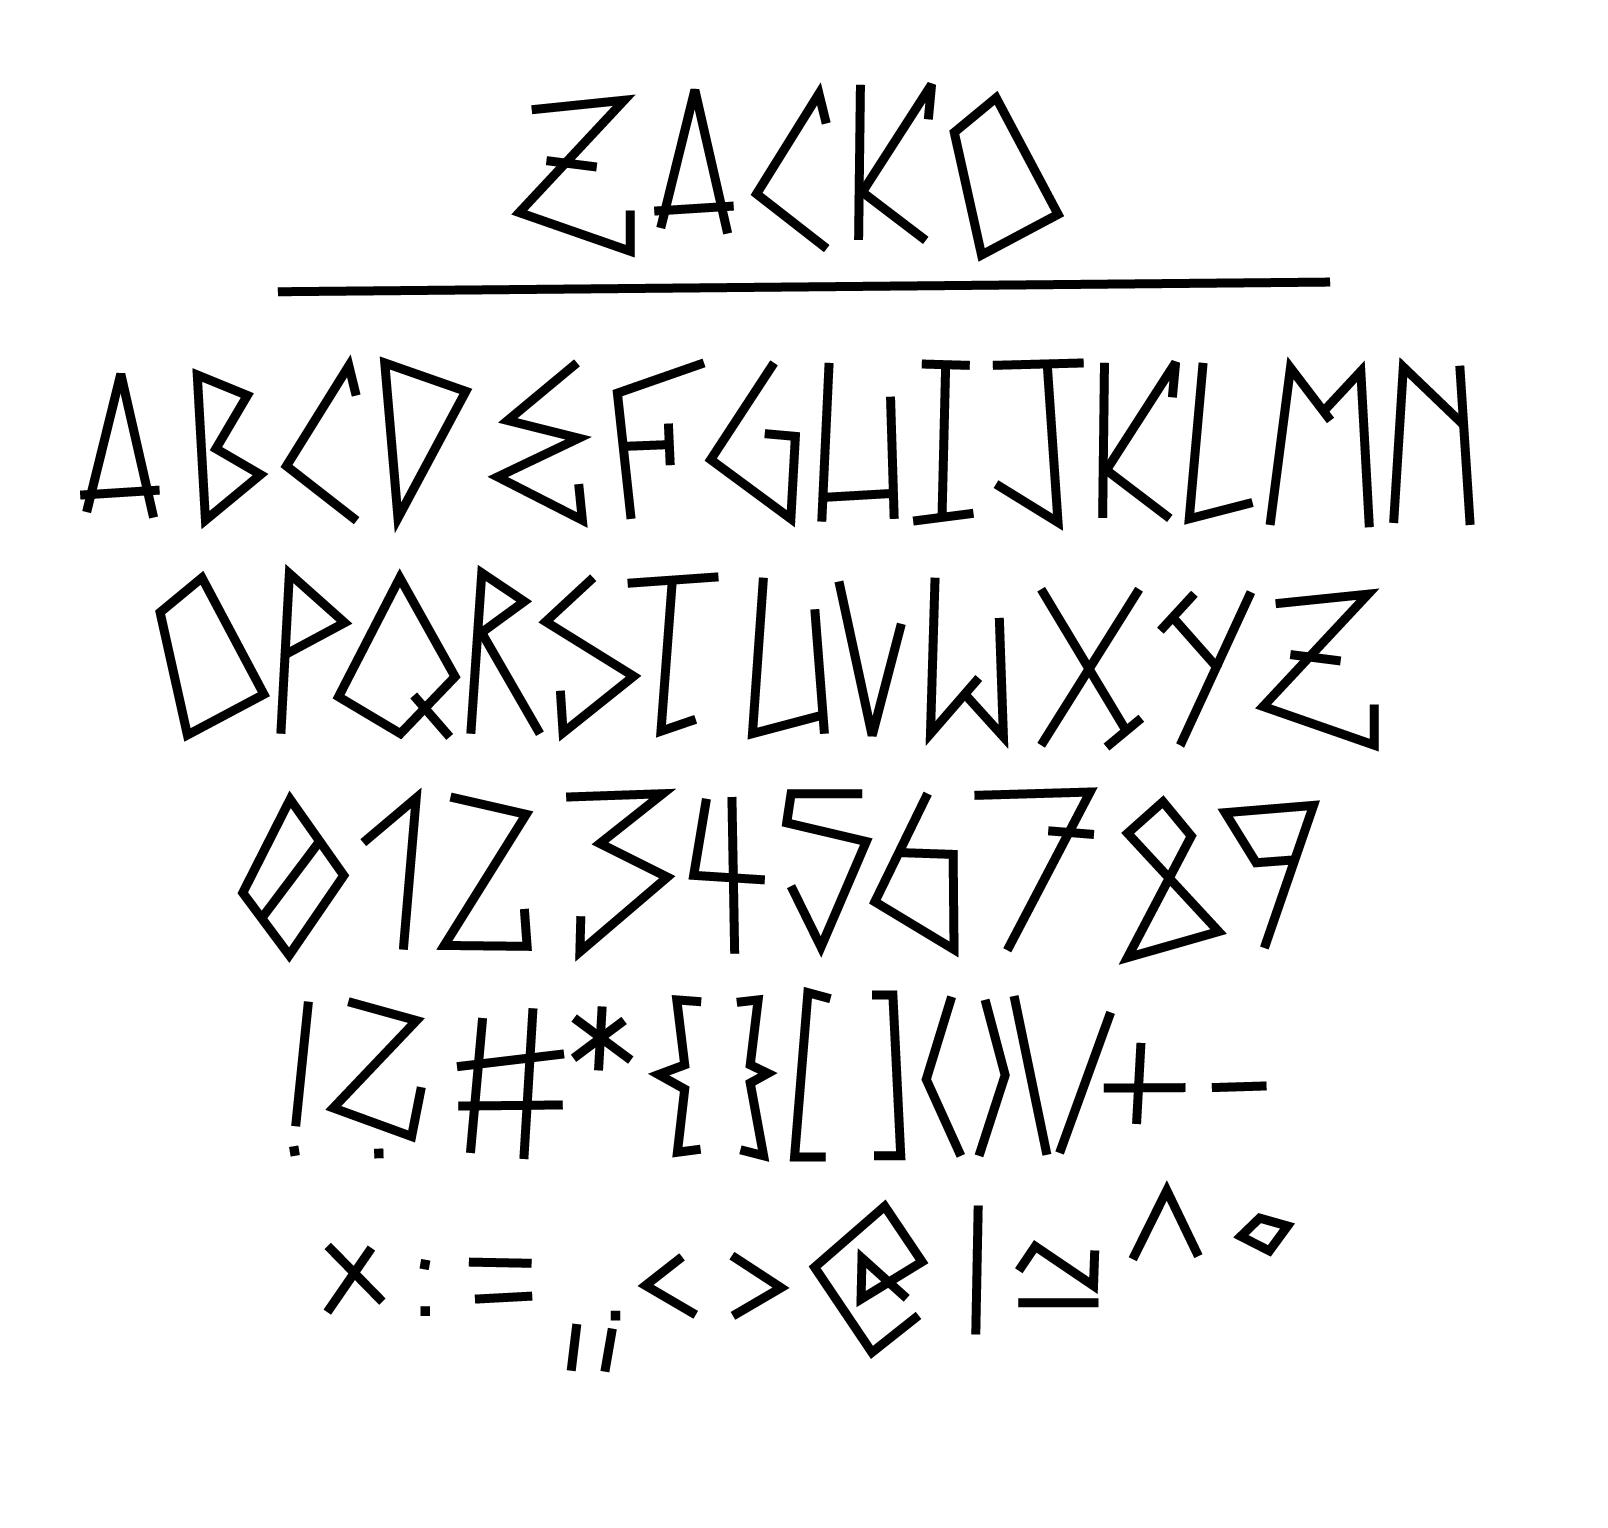 zacko.png